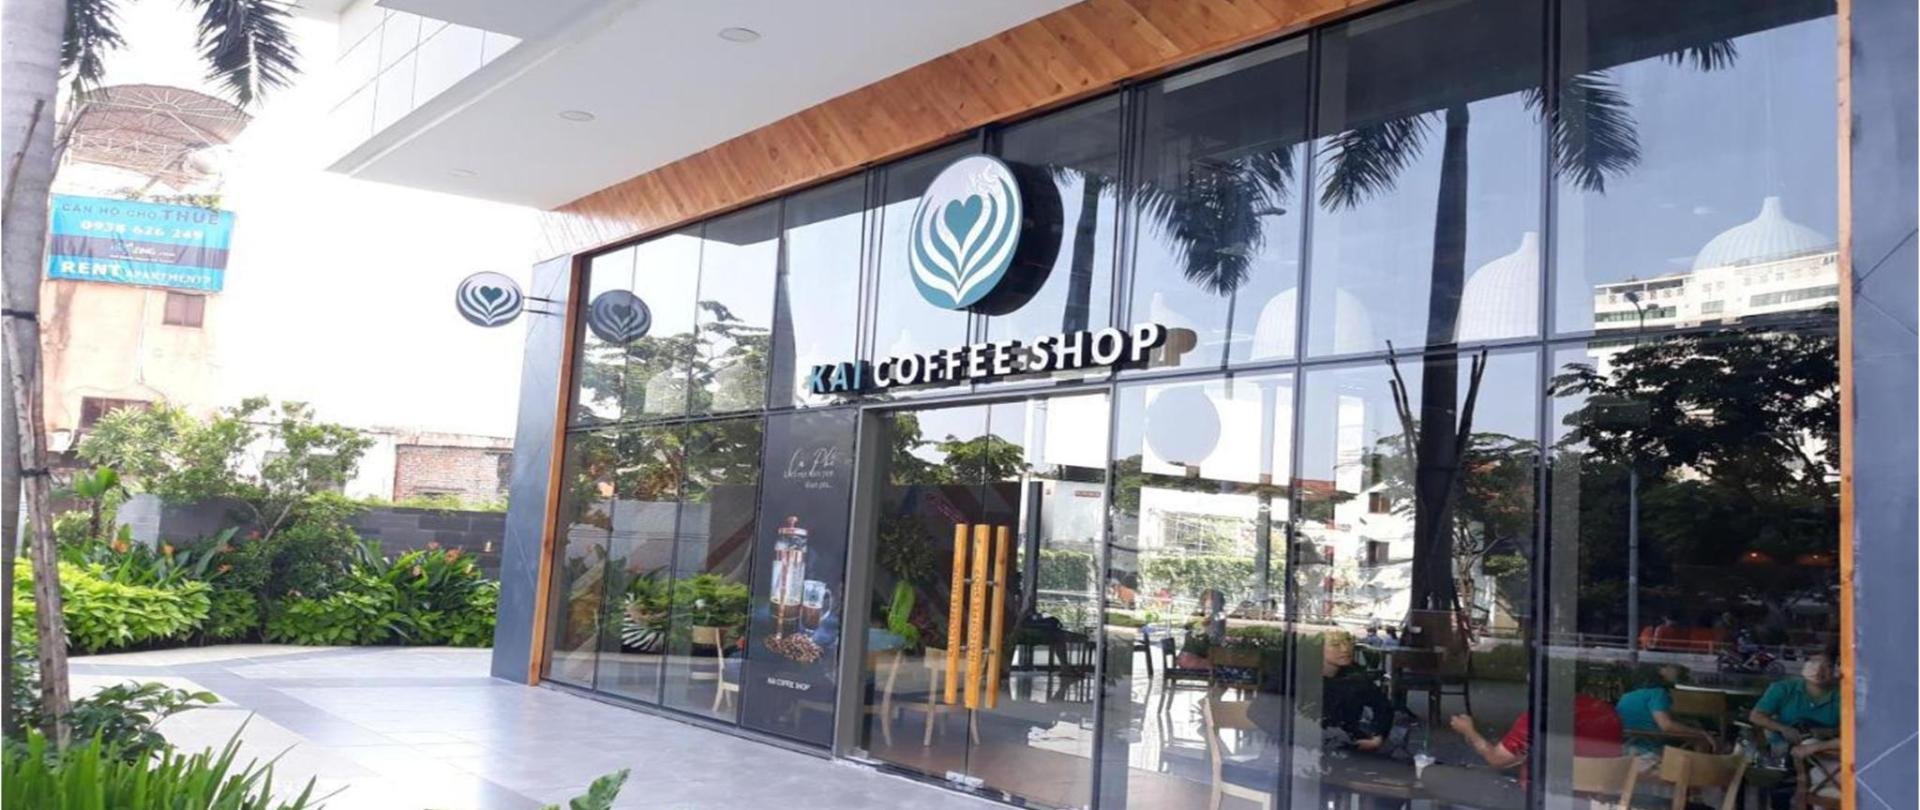 trip-apartment-saigon-coffee-shop.png